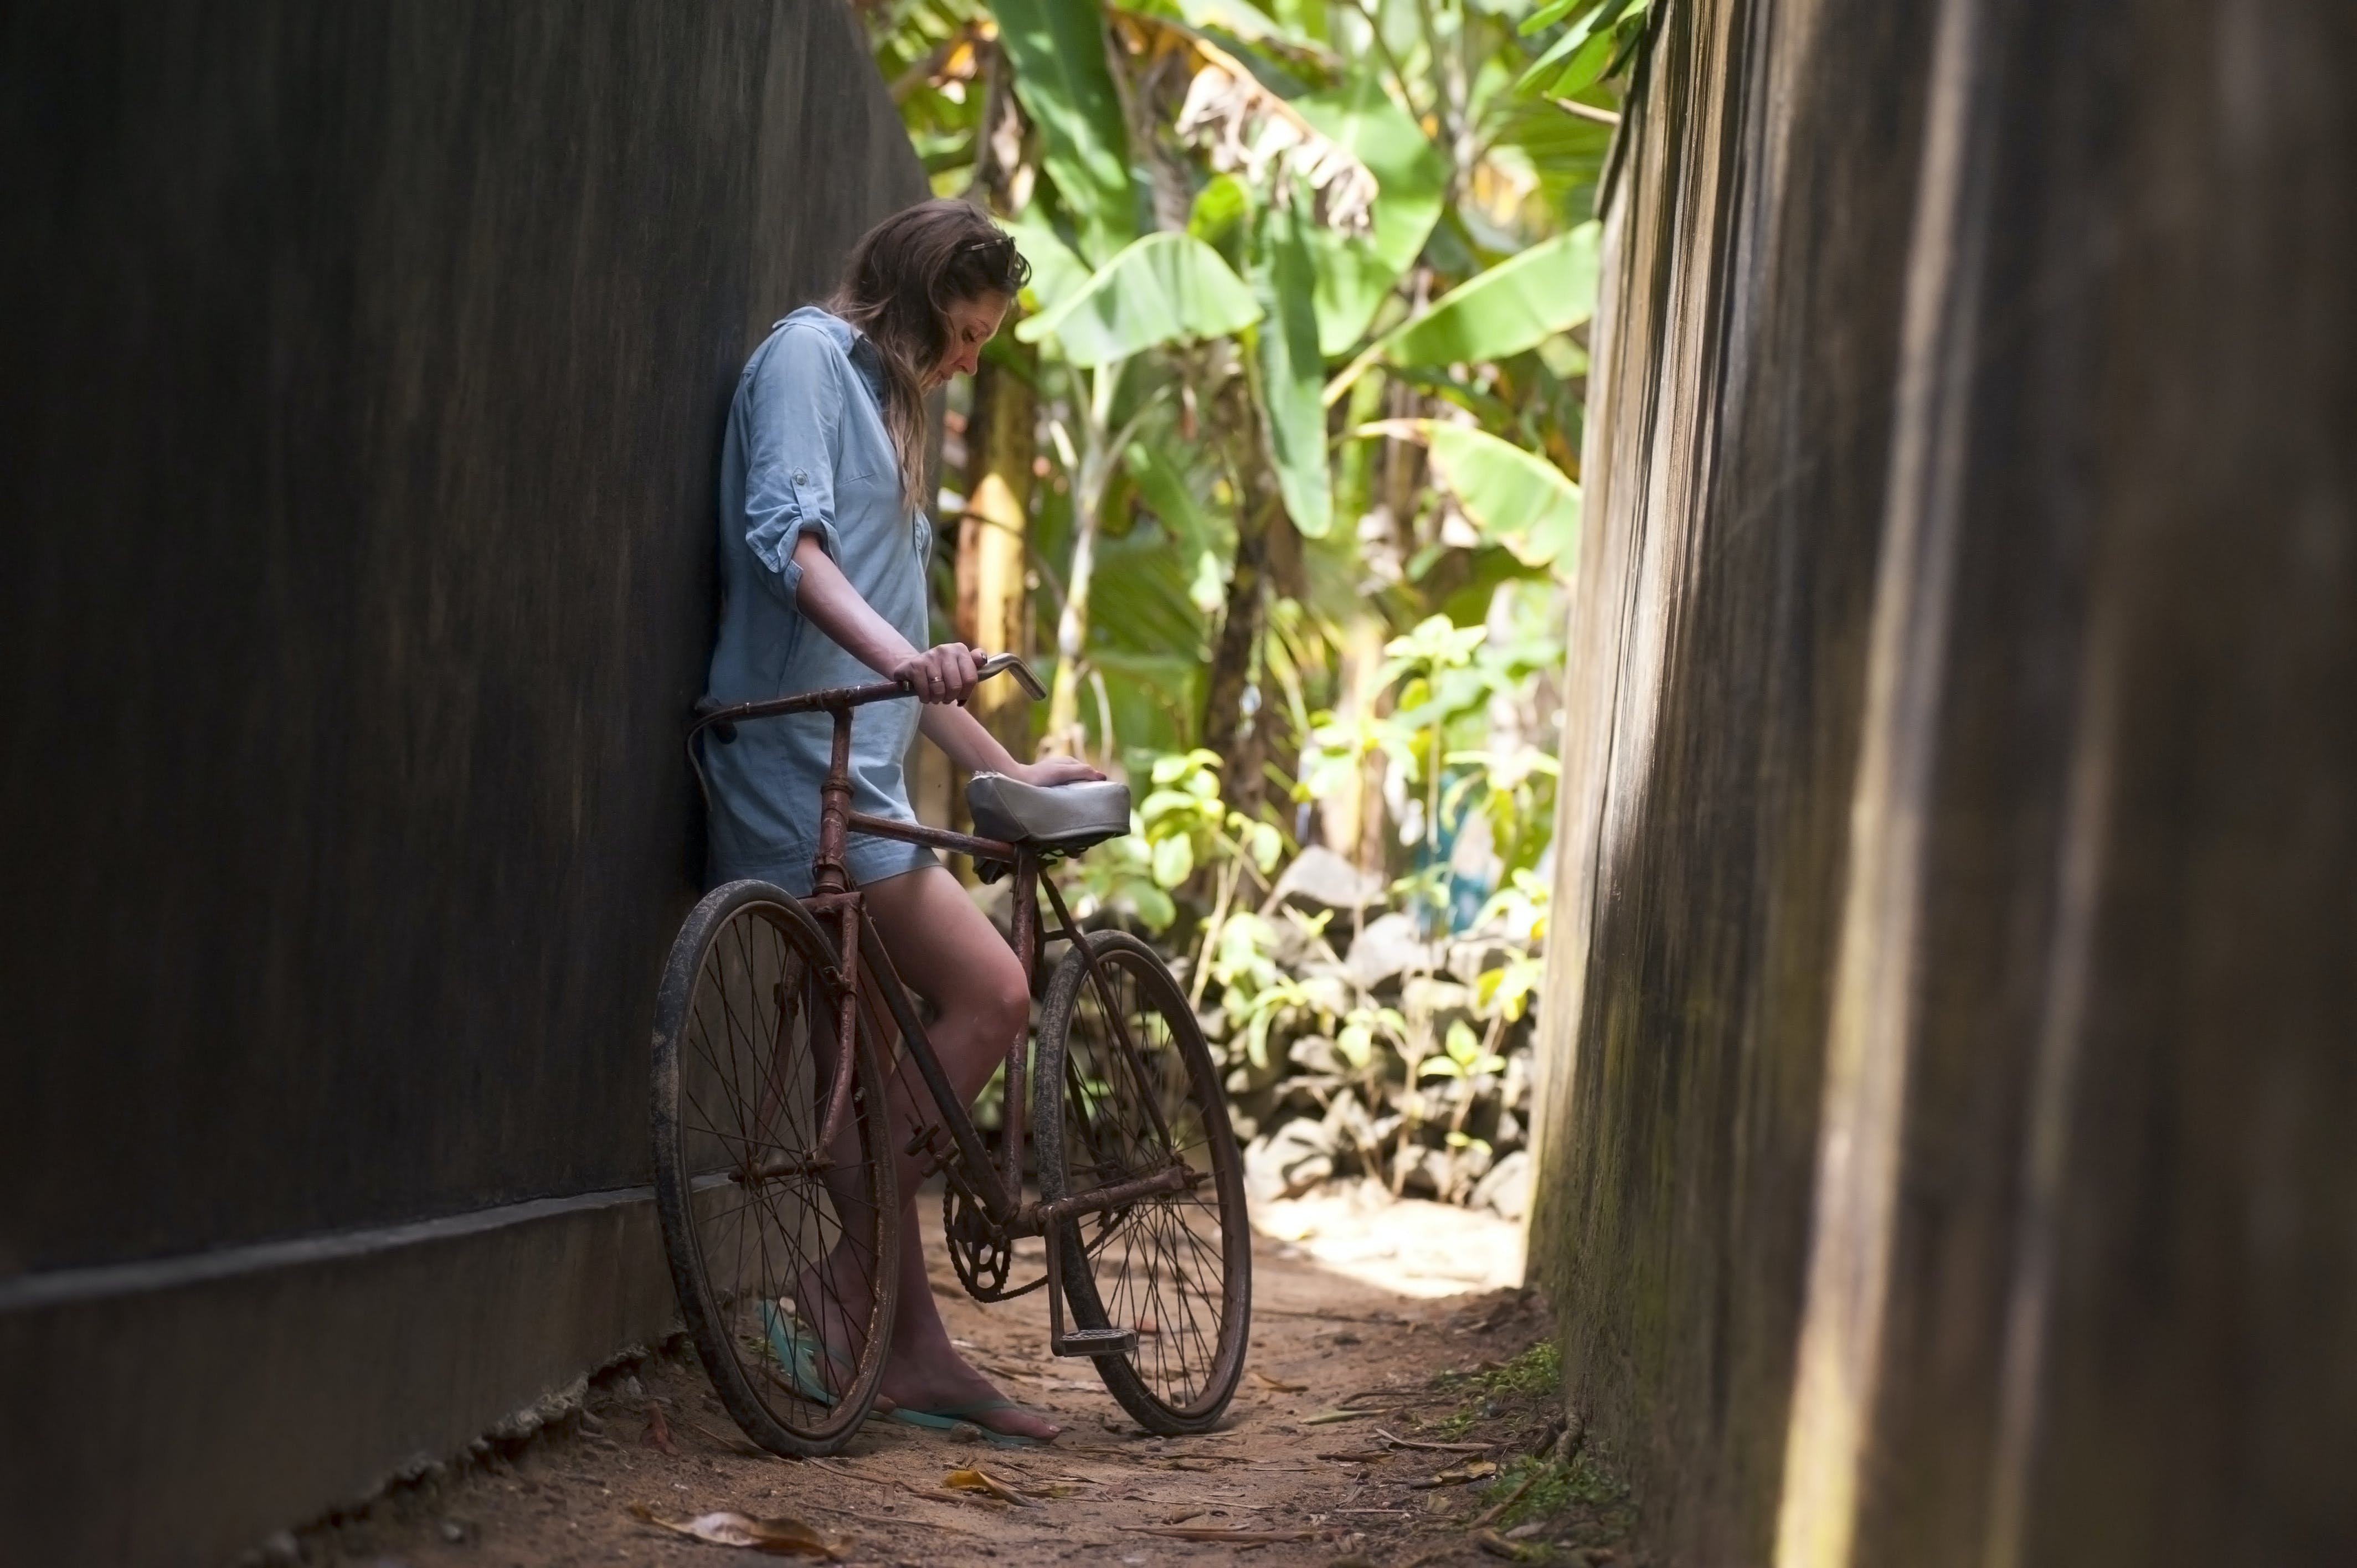 Woman Standing Beside Bike Leaning on Wall